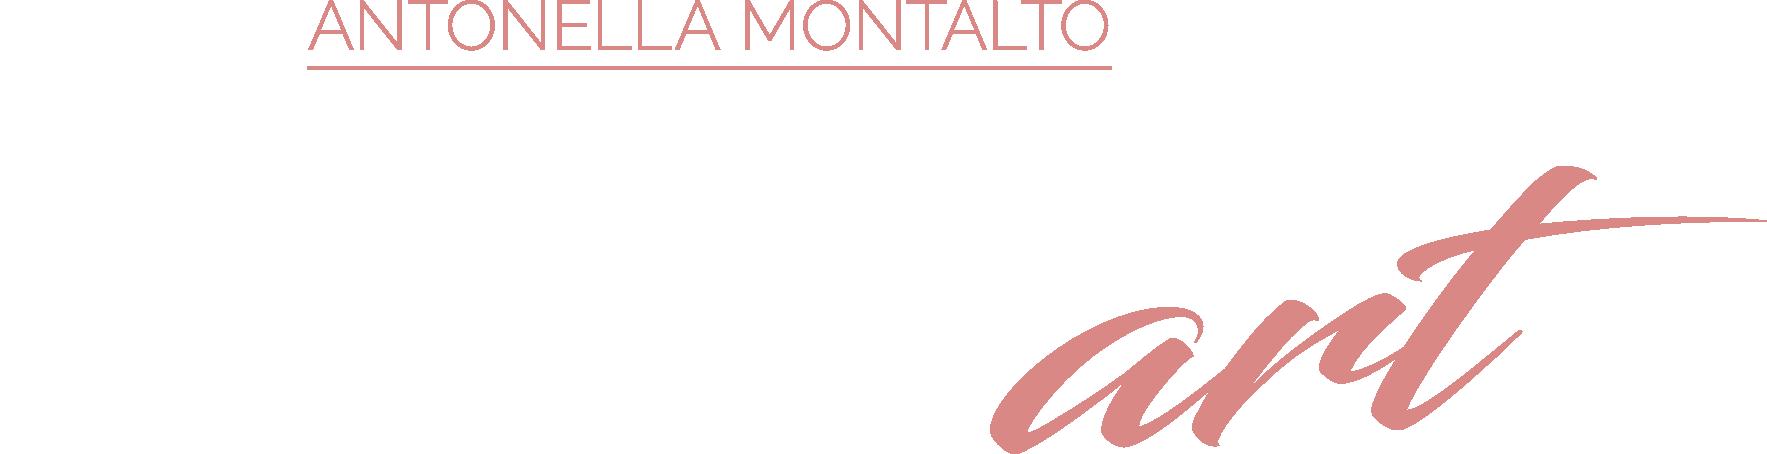 Glattart Logo